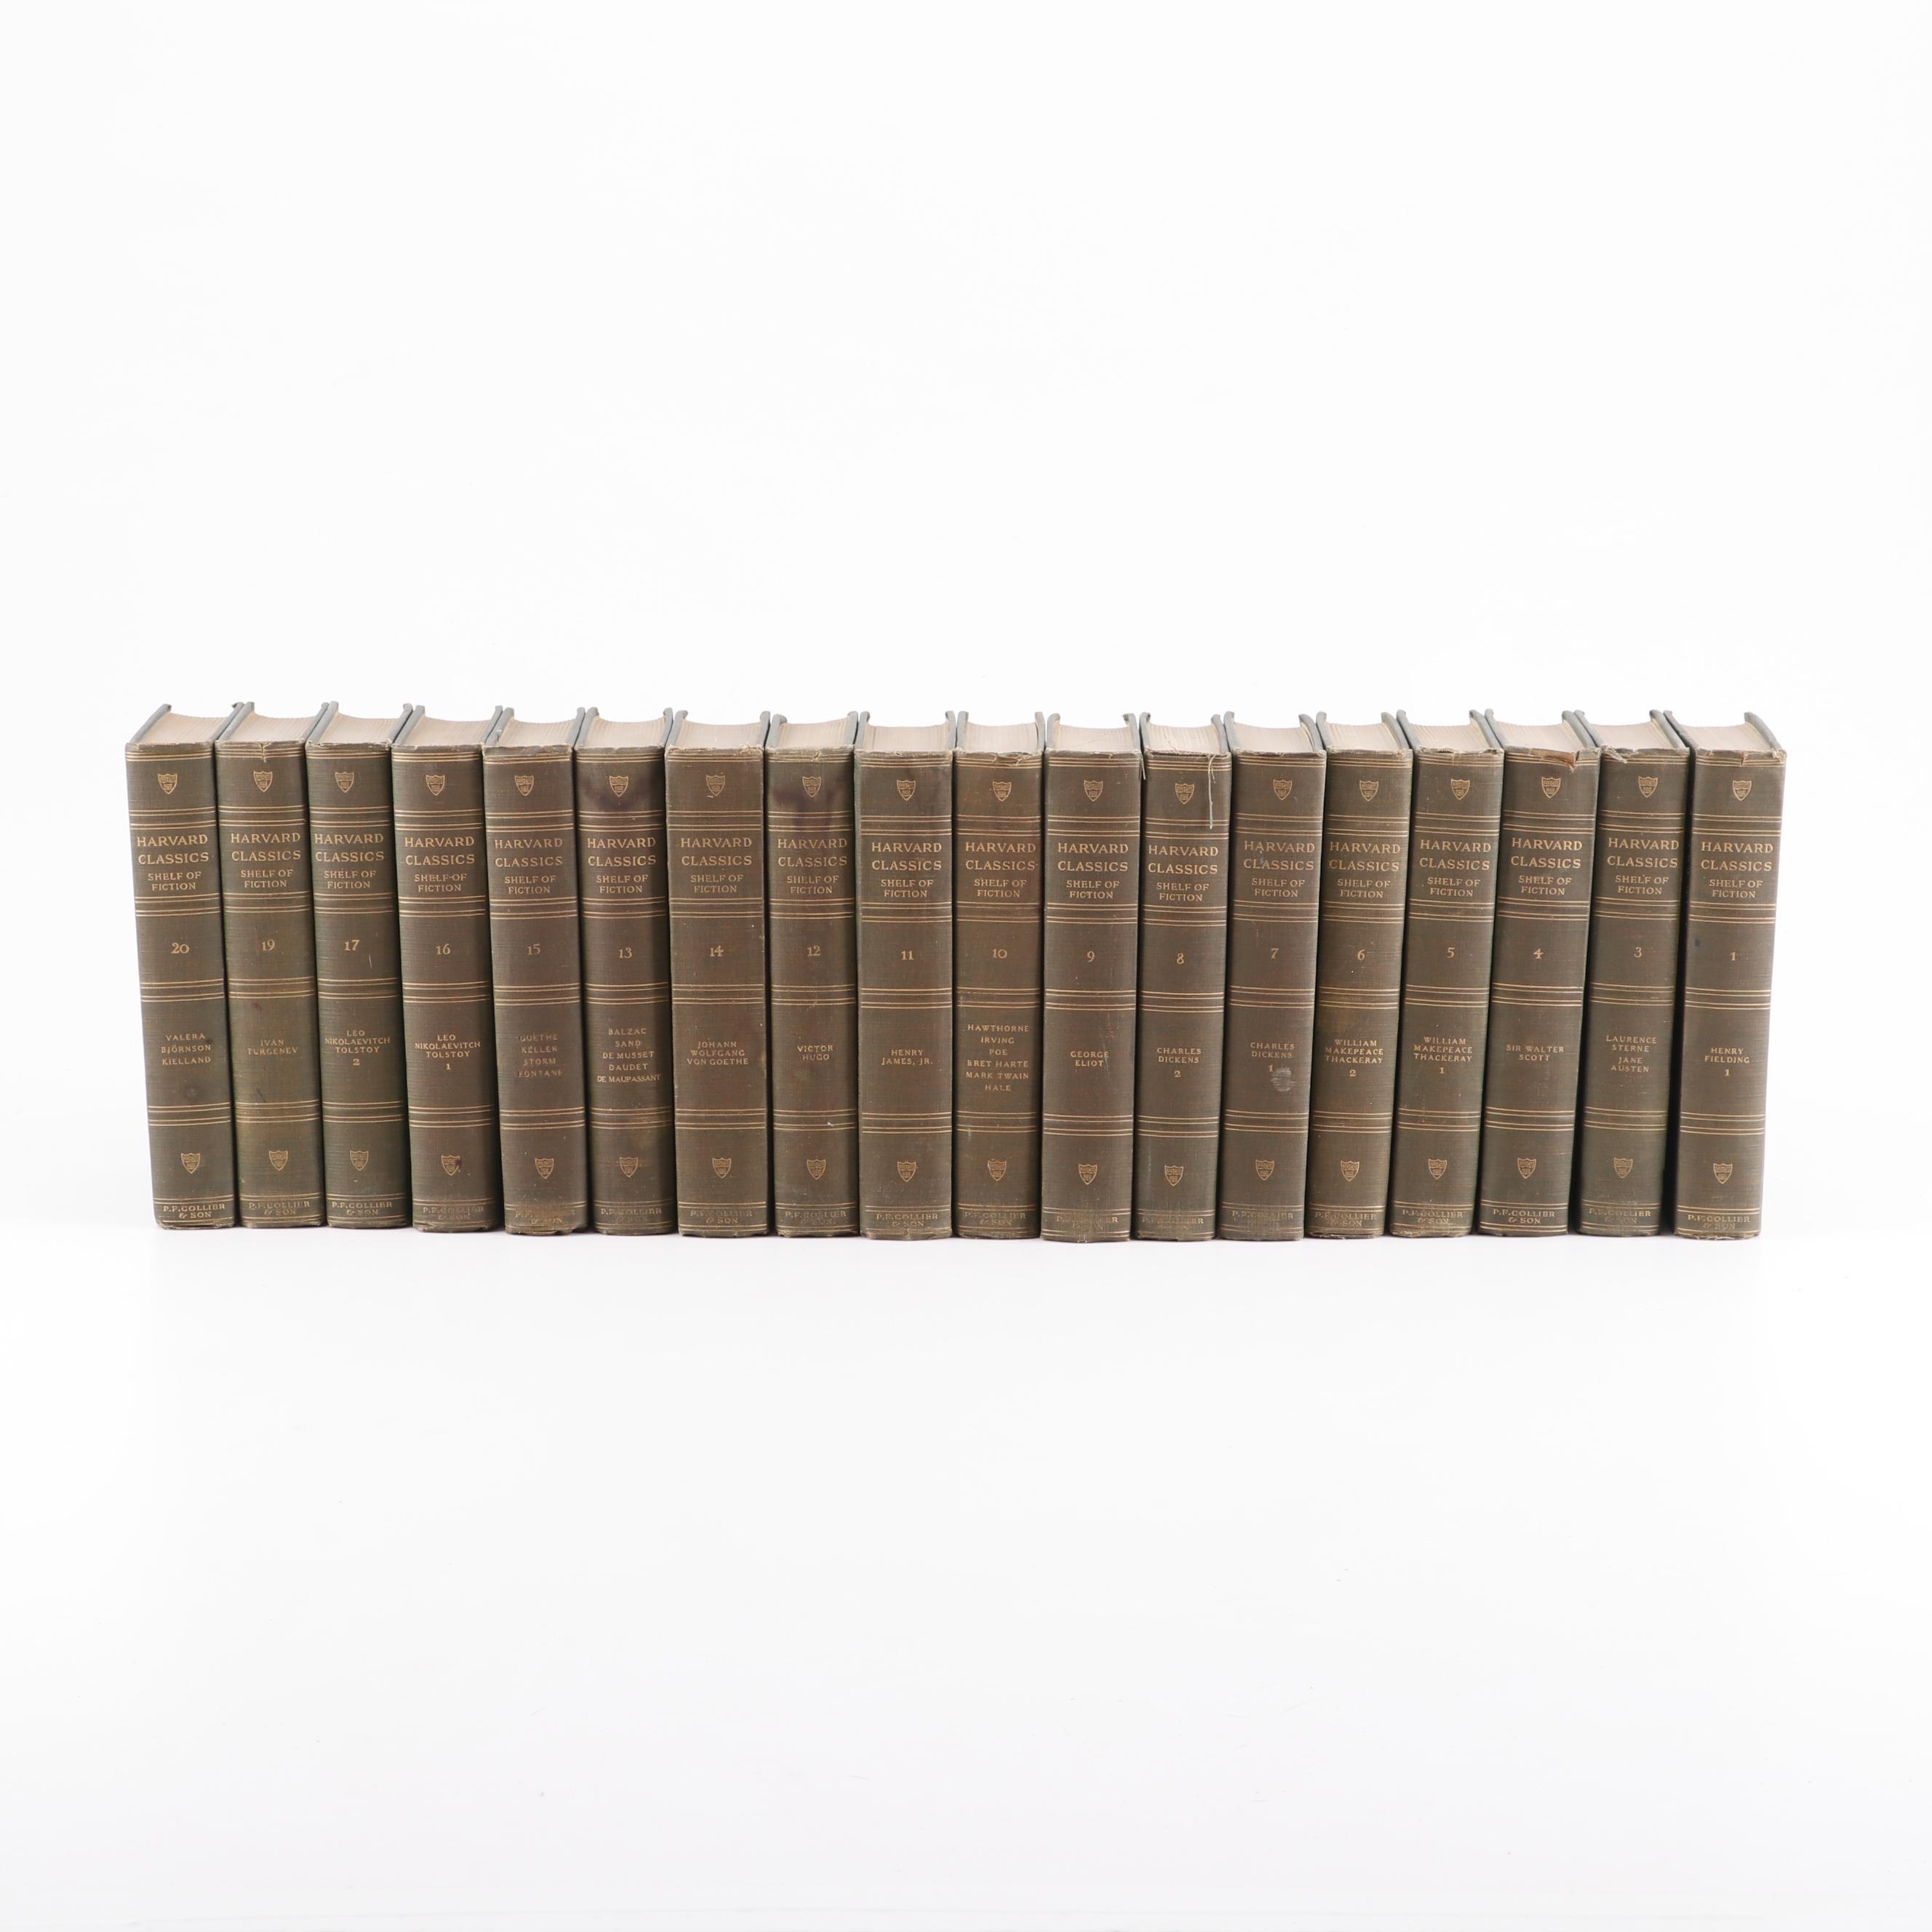 "1917 ""The Harvard Classics Volumes 1-20"" Edited by William Alan Neilson Ph.D"